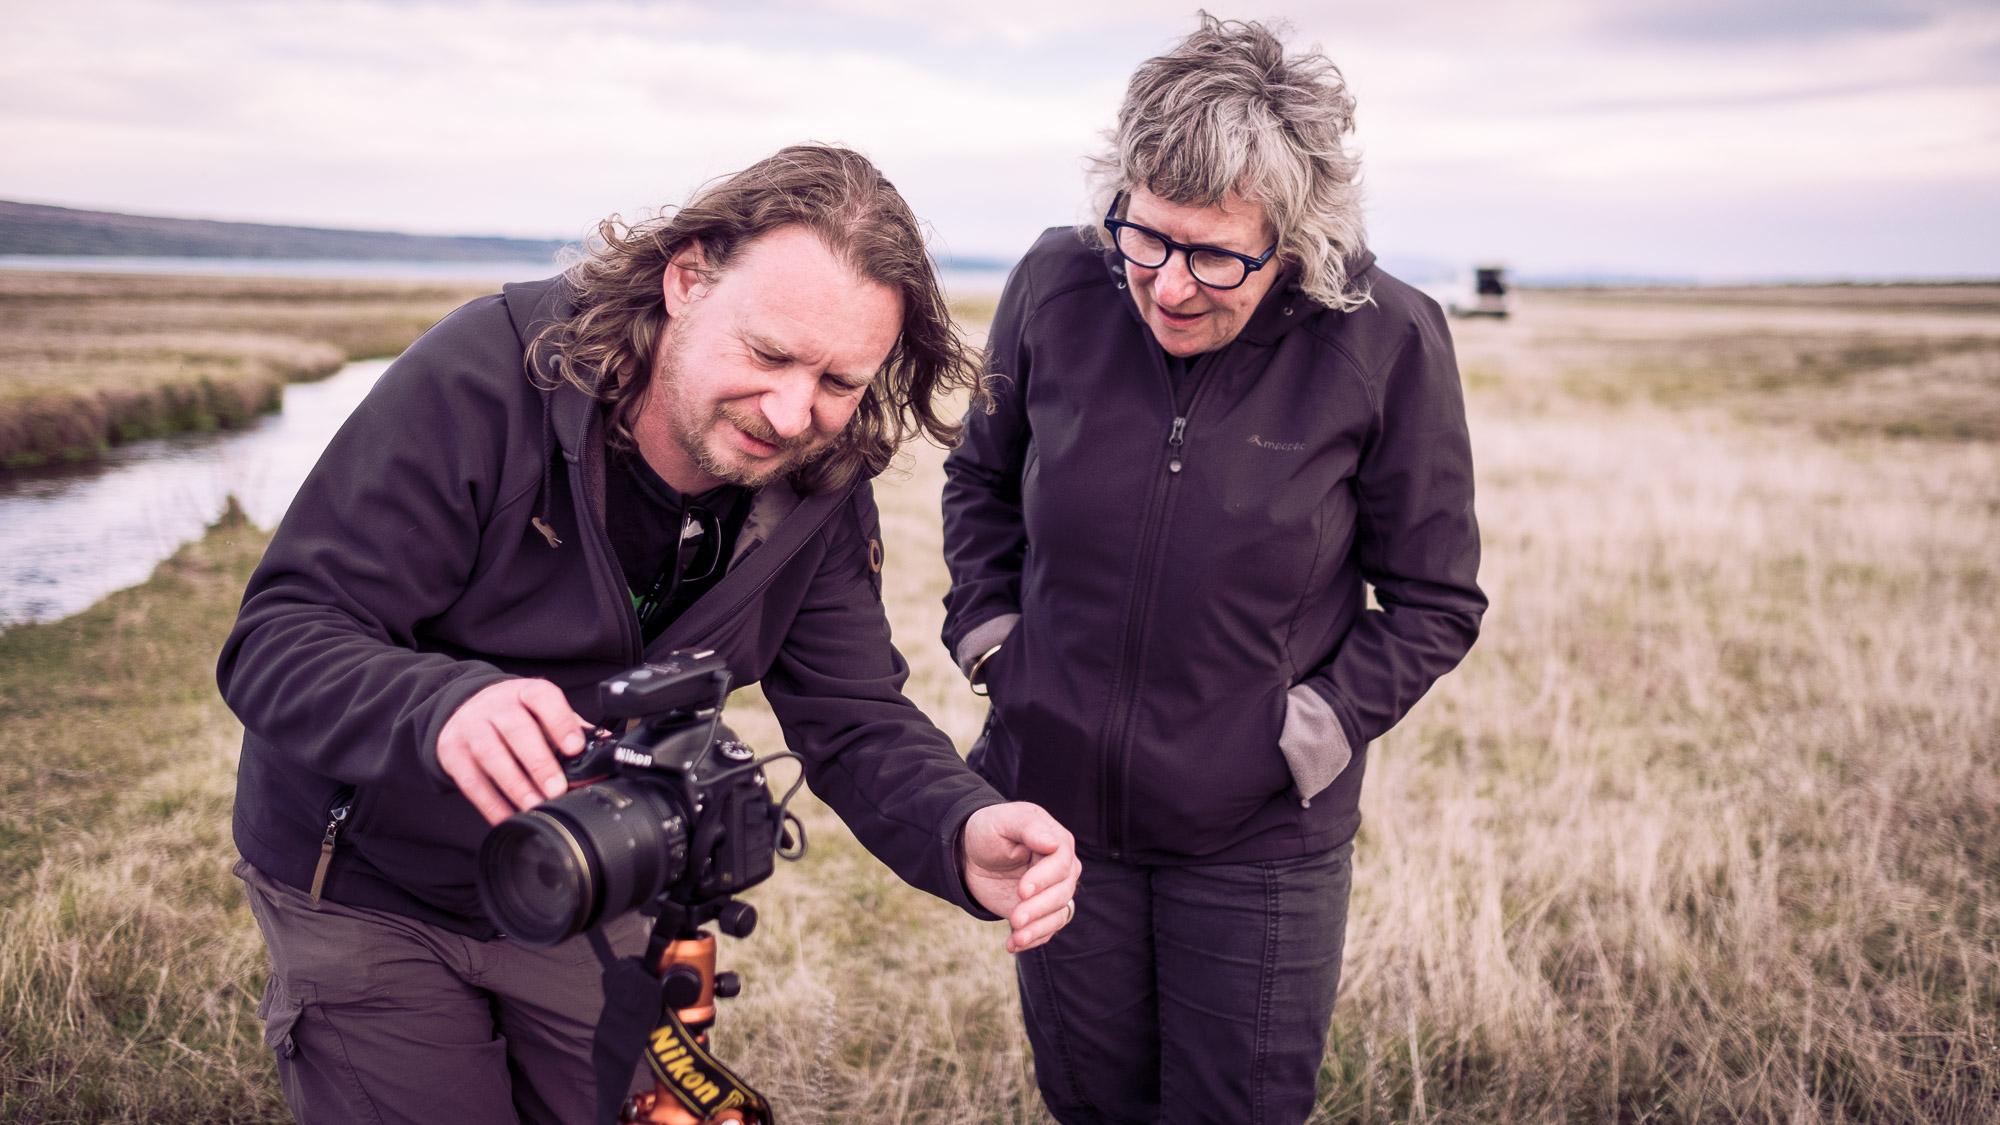 photography-workshop-newzealand-mountcook2018-19.jpg